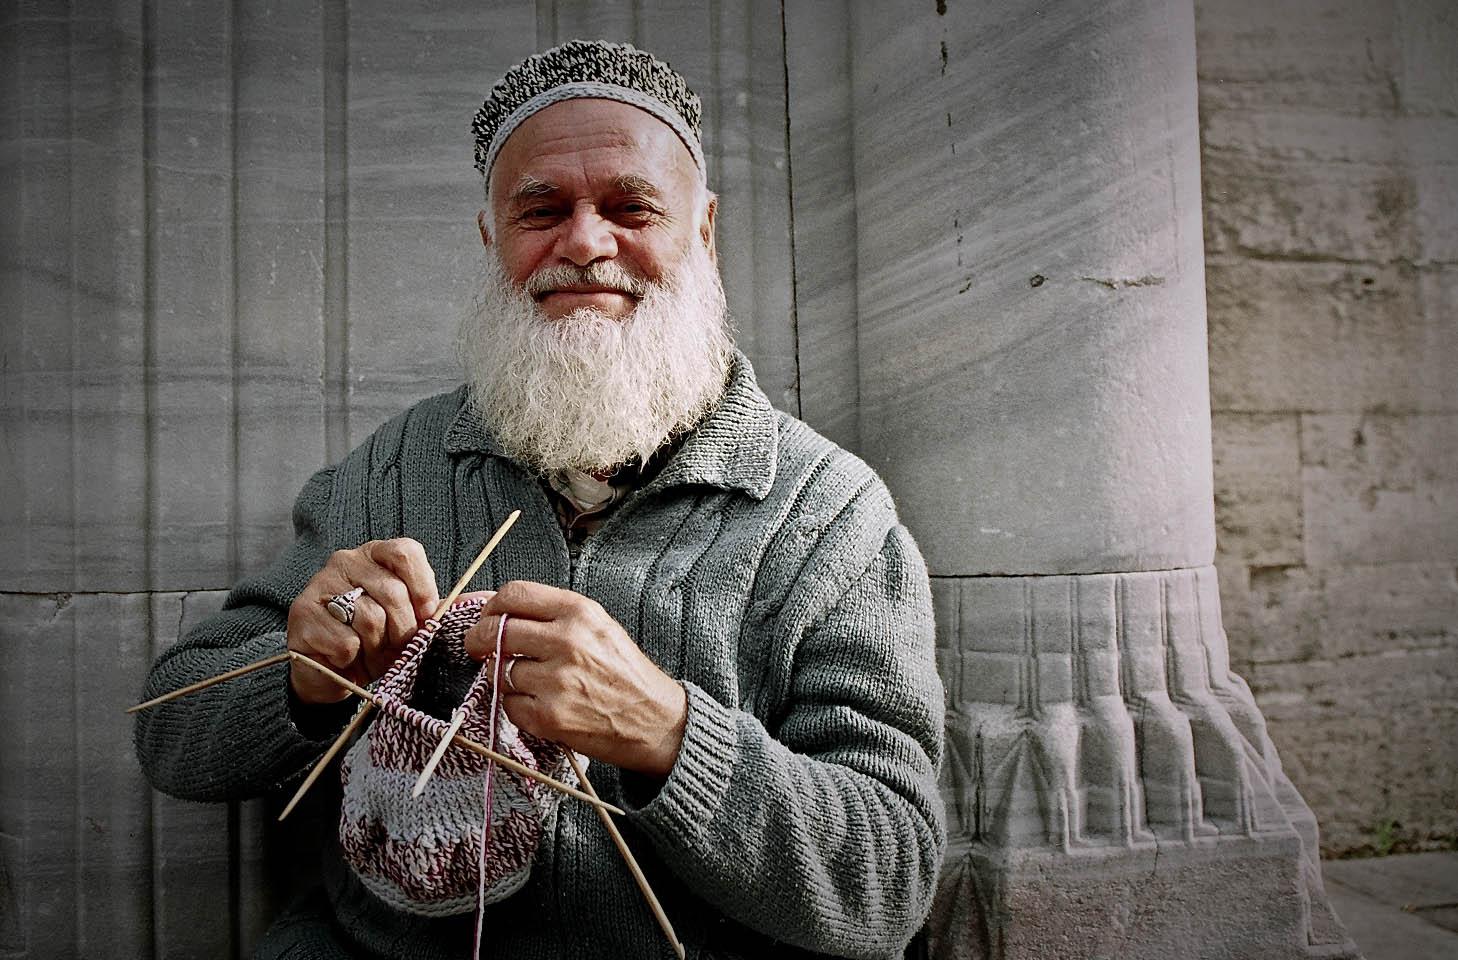 knitting-man-1-of-11.jpg